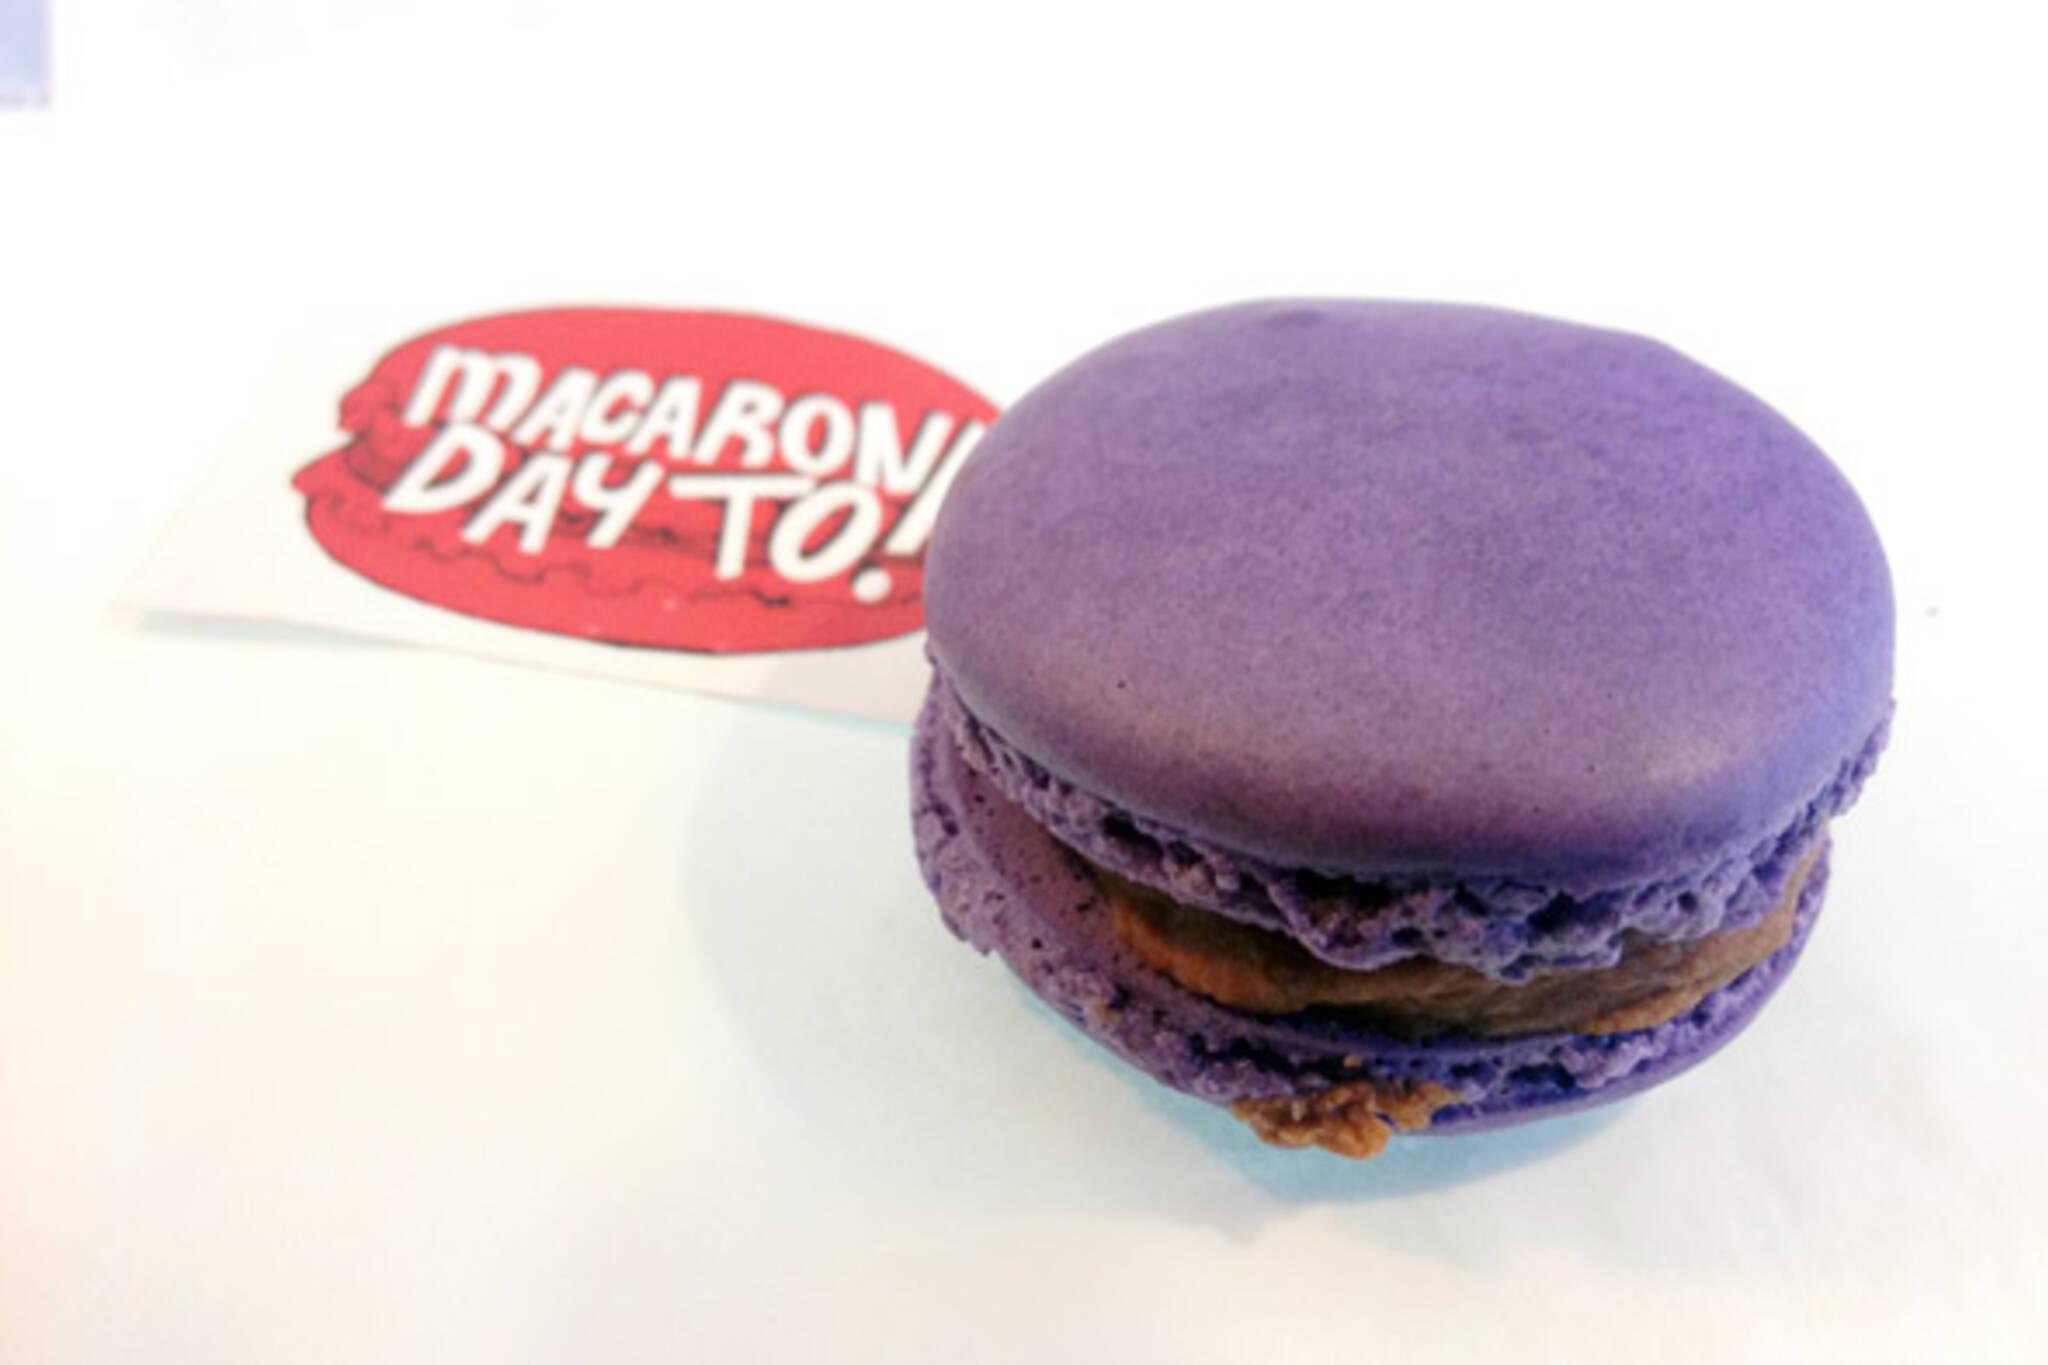 Macaron Day